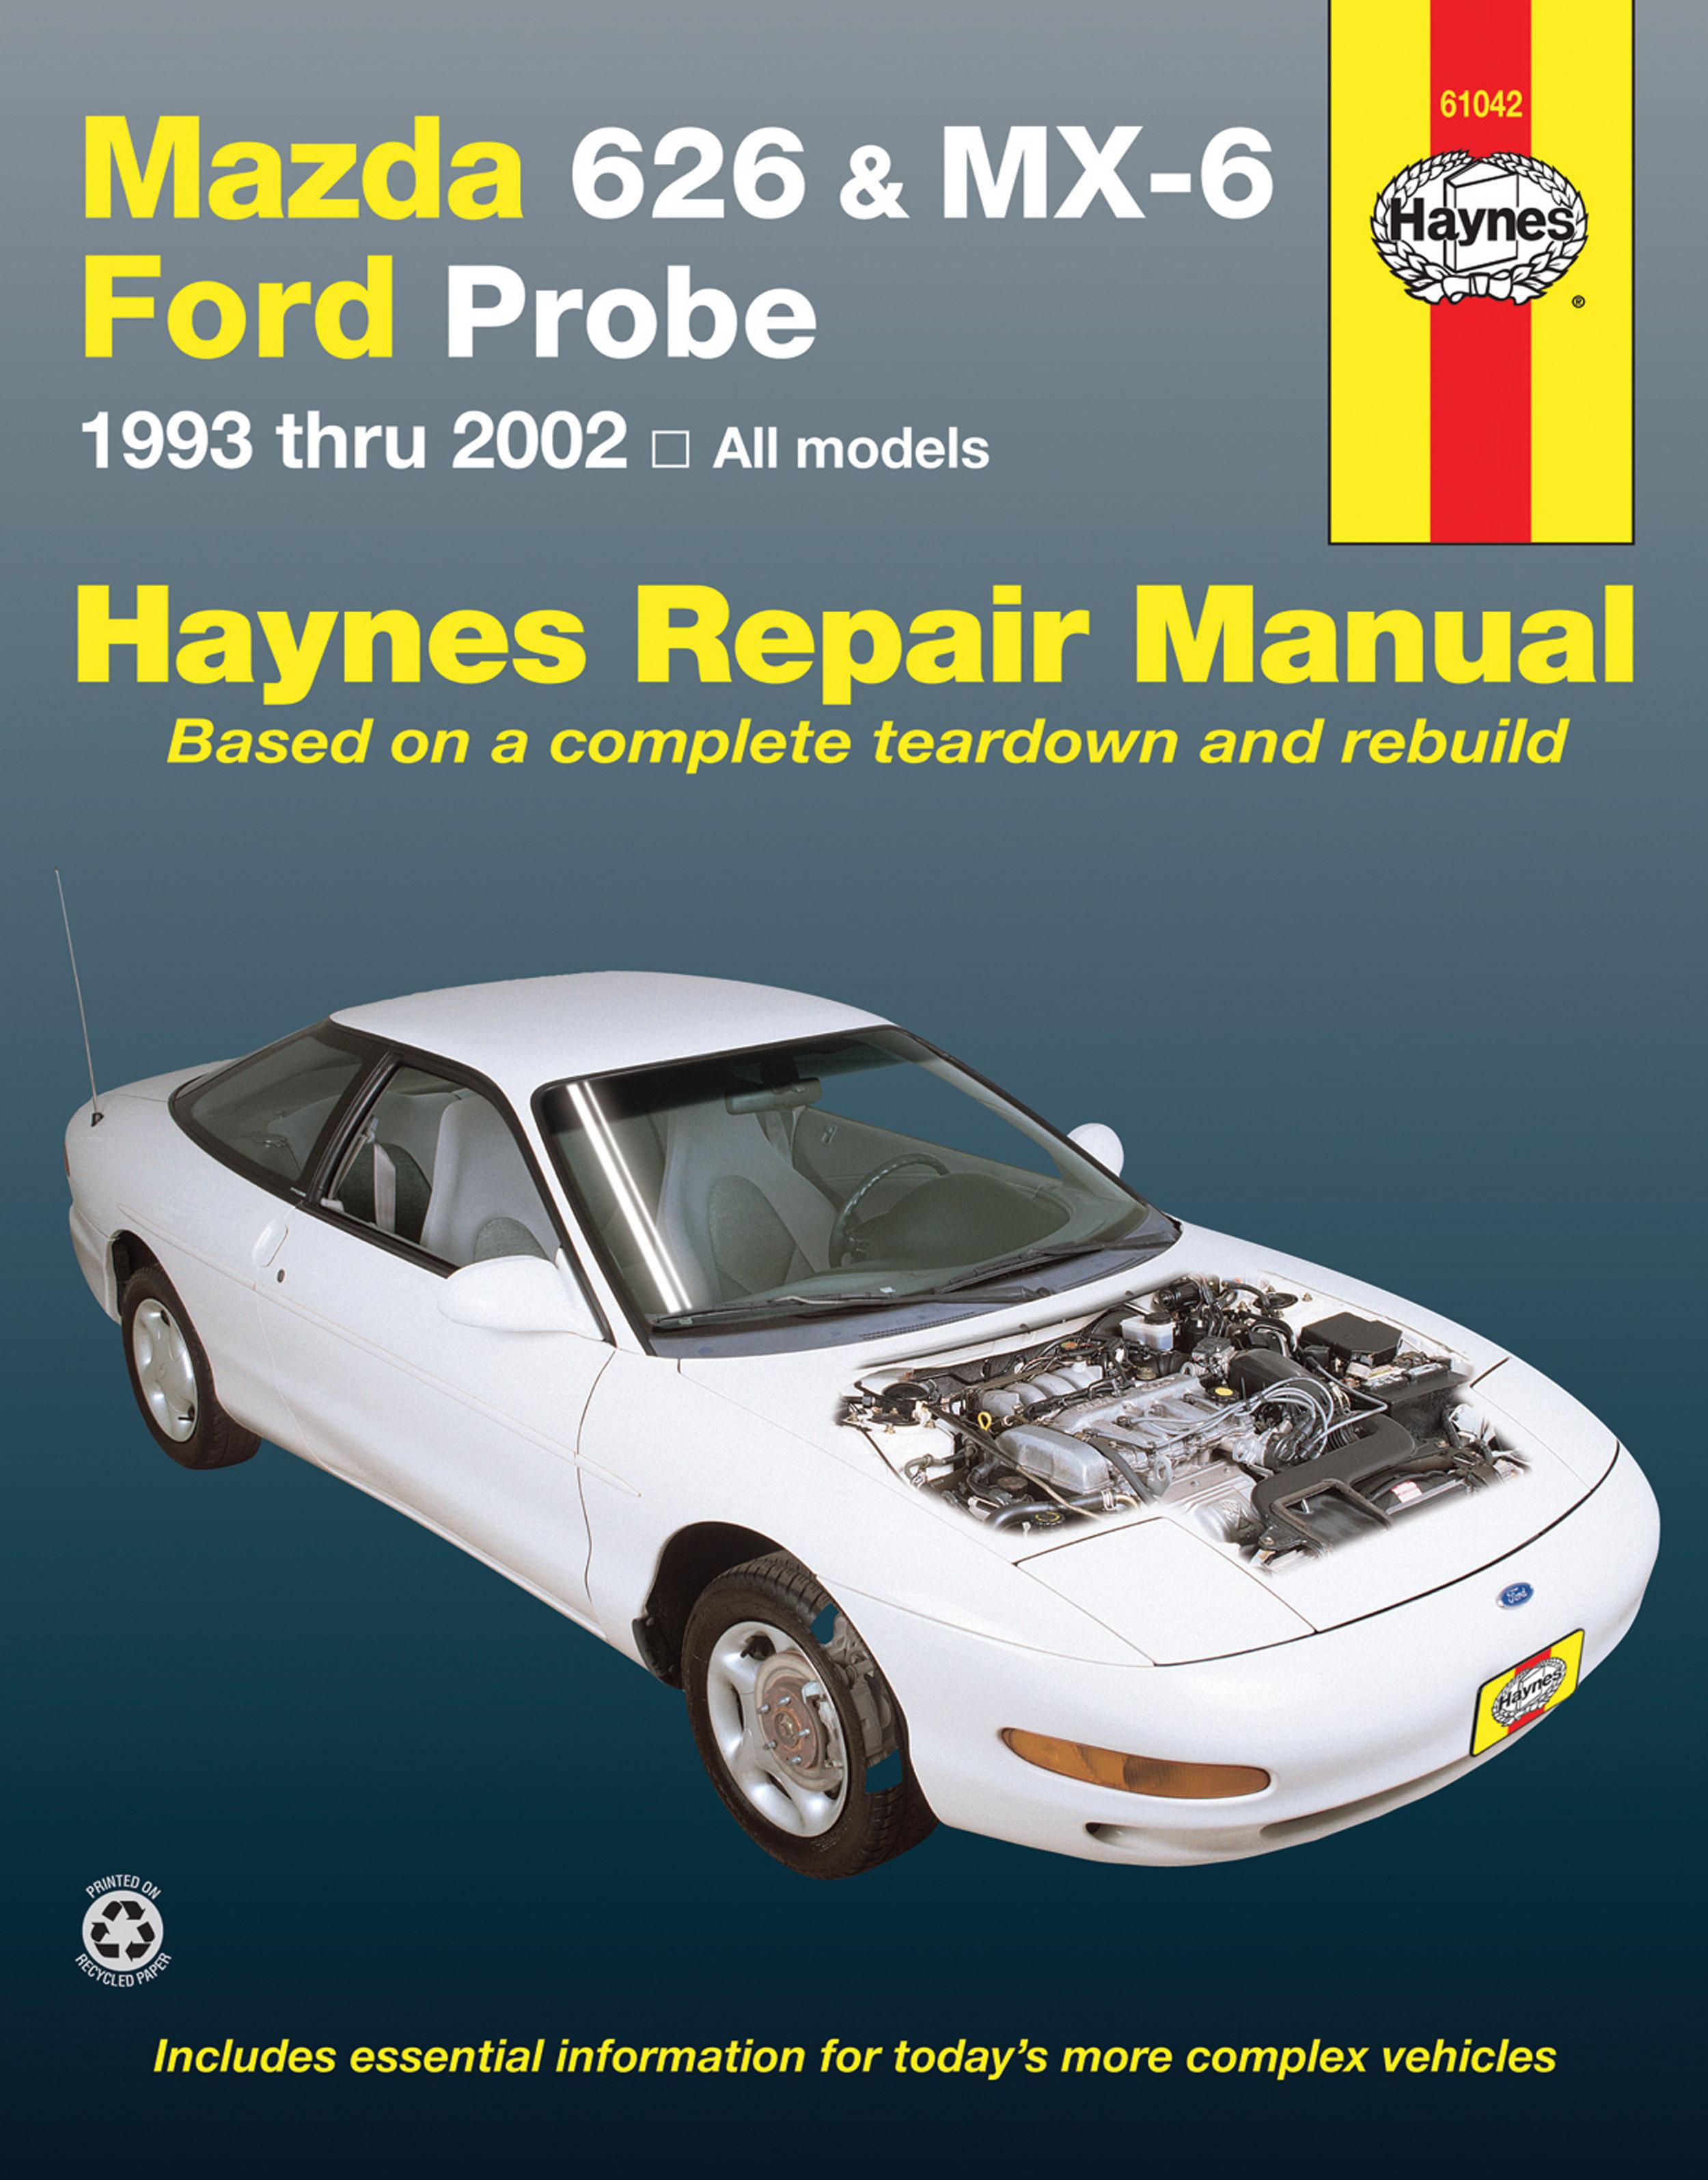 1994 Ford Probe Wiring Diagram Wiring Diagram Schematic 1997 Ford